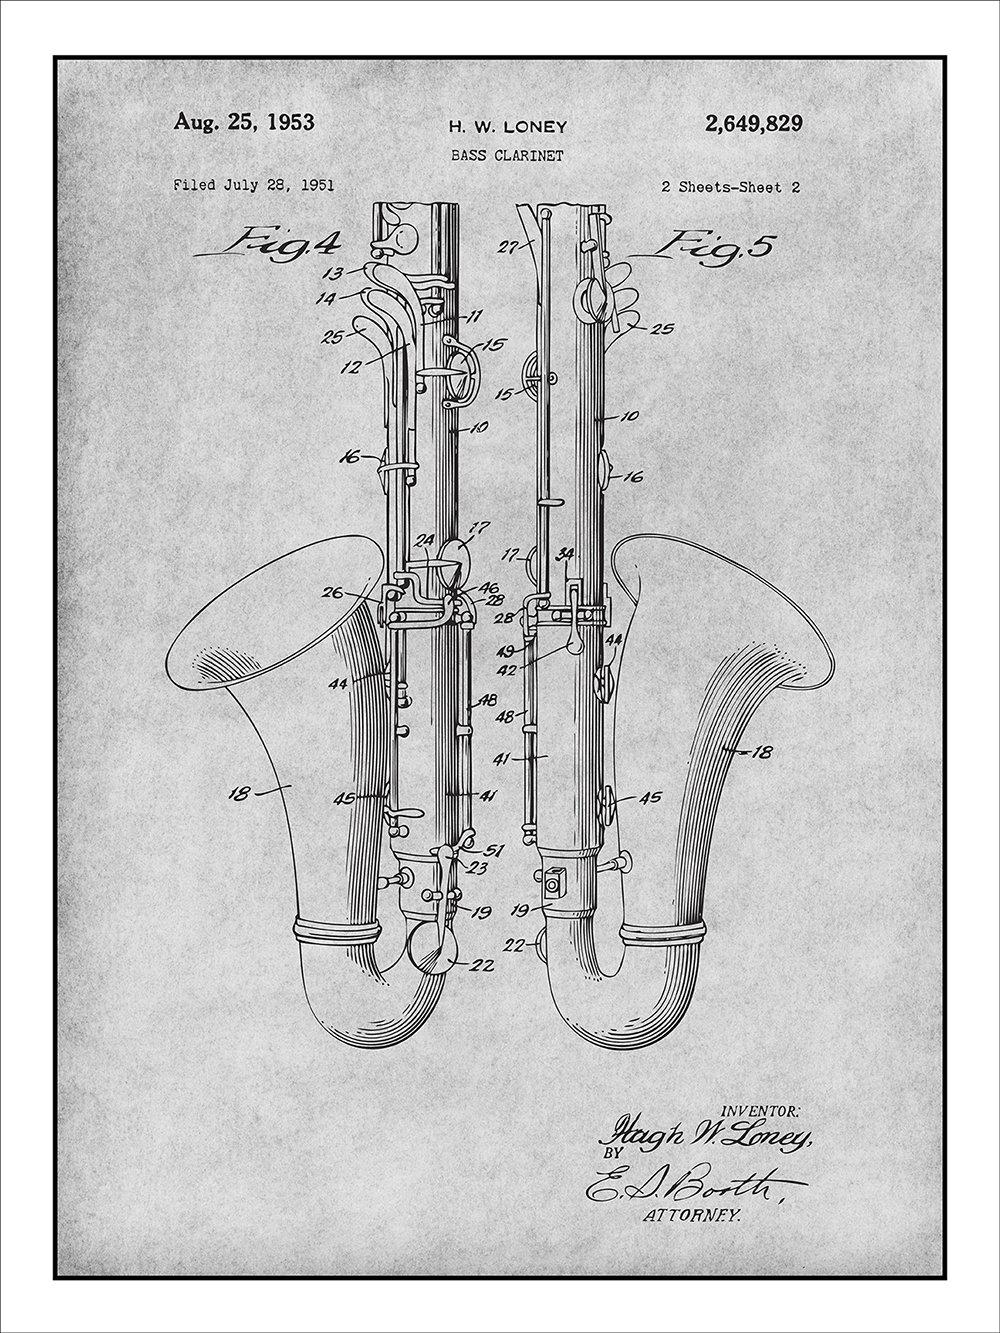 819Zuk2jOSL._SL1333_ amazon com 1951 loney bass clarinet patent print art poster